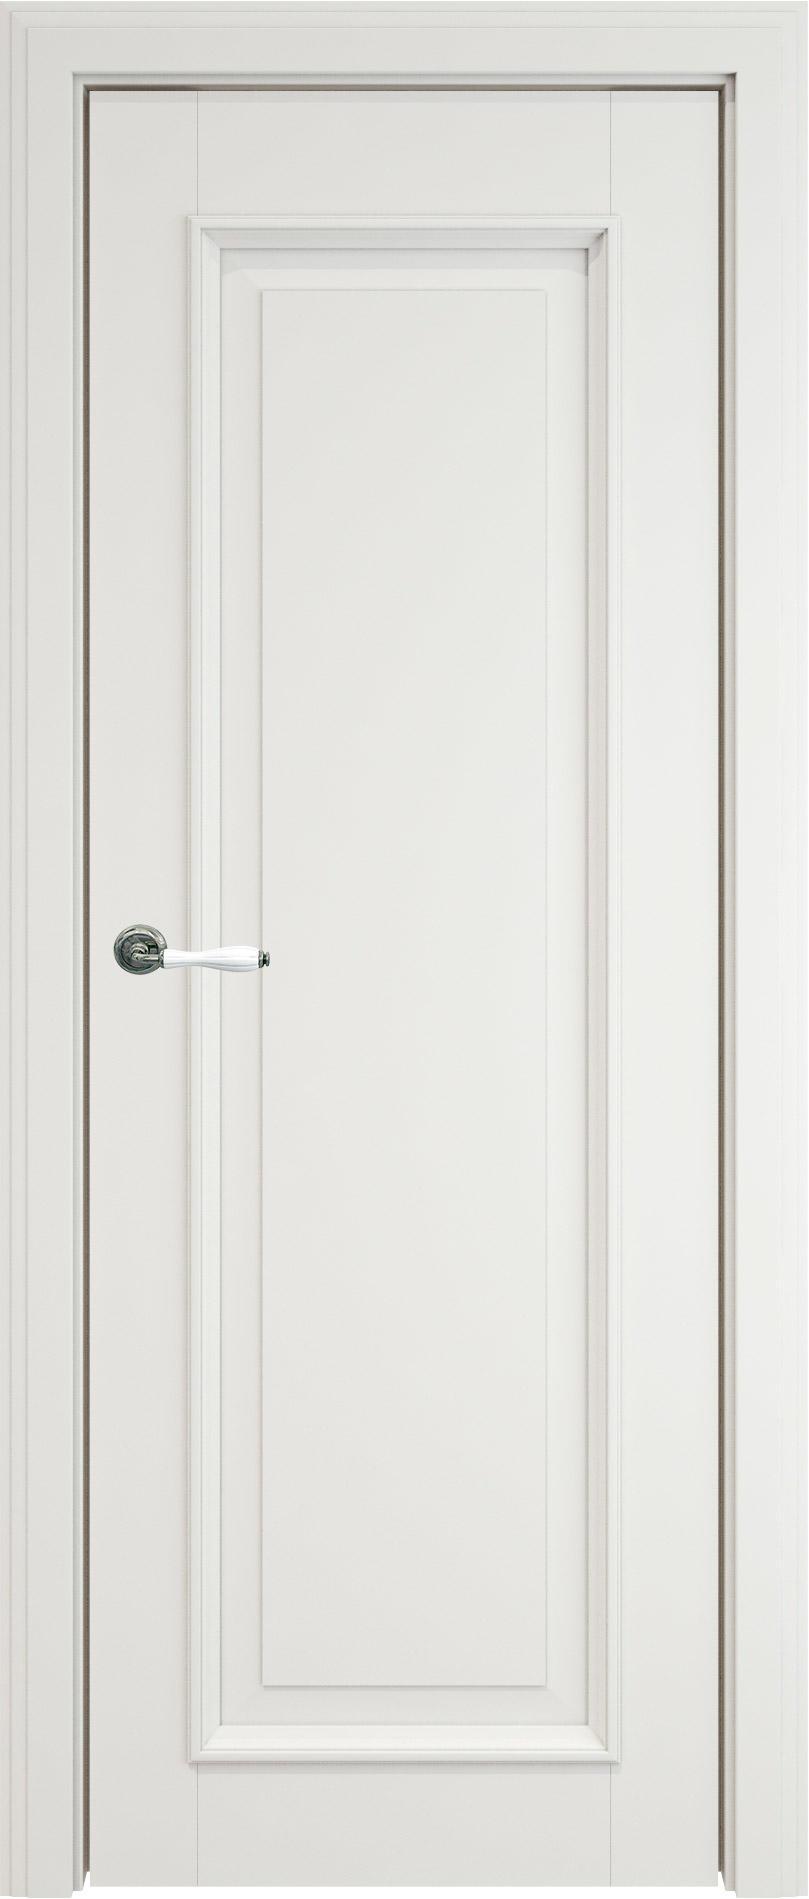 Domenica LUX цвет - Белая эмаль (RAL 9003) Без стекла (ДГ)